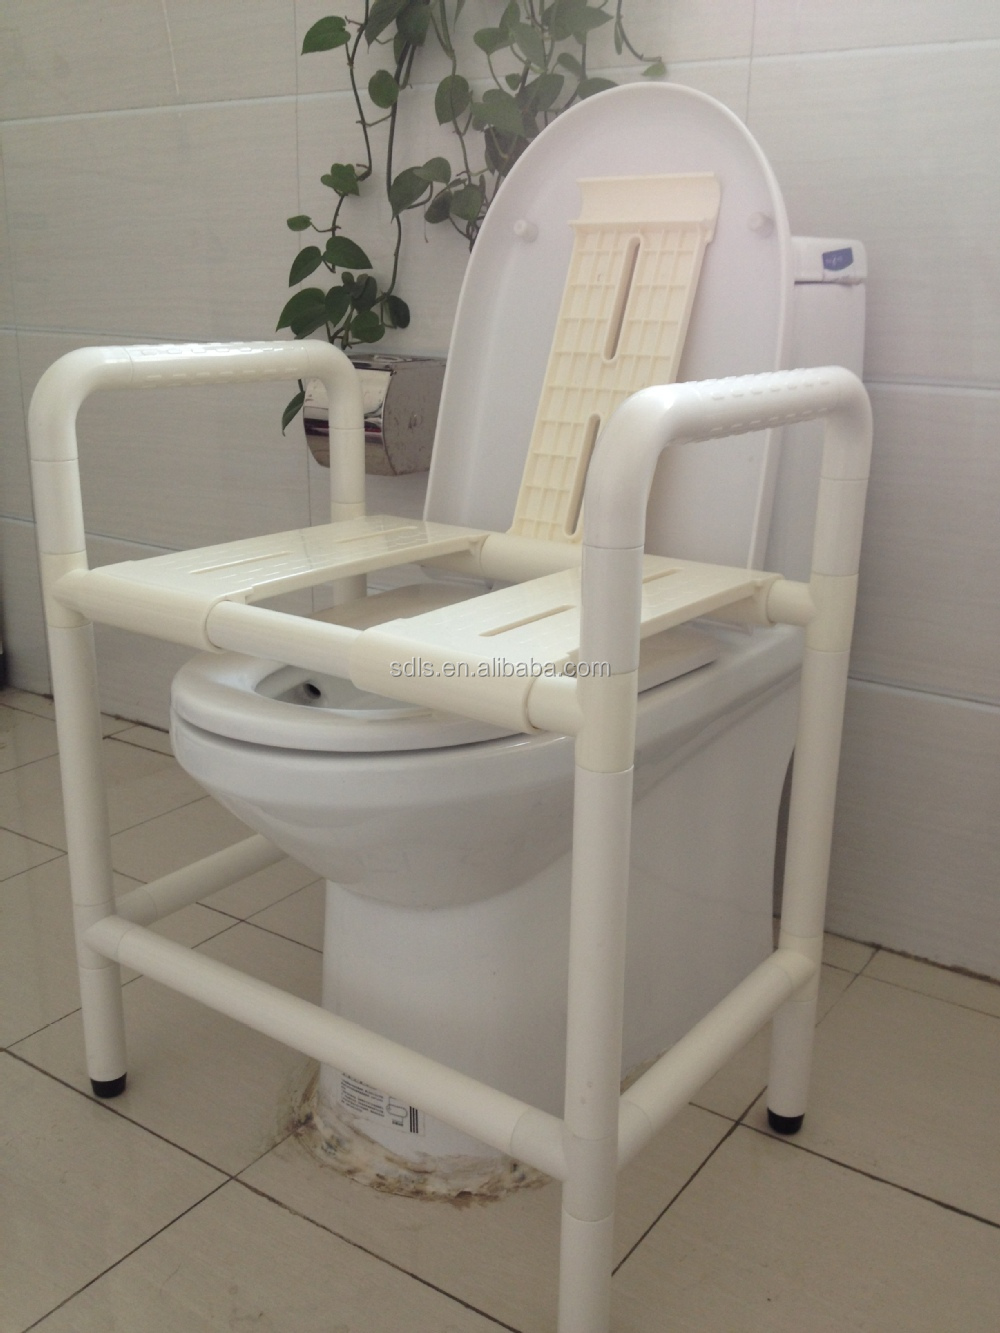 Handicap Nylon Patient Toilet Chair Buy Patient Toilet